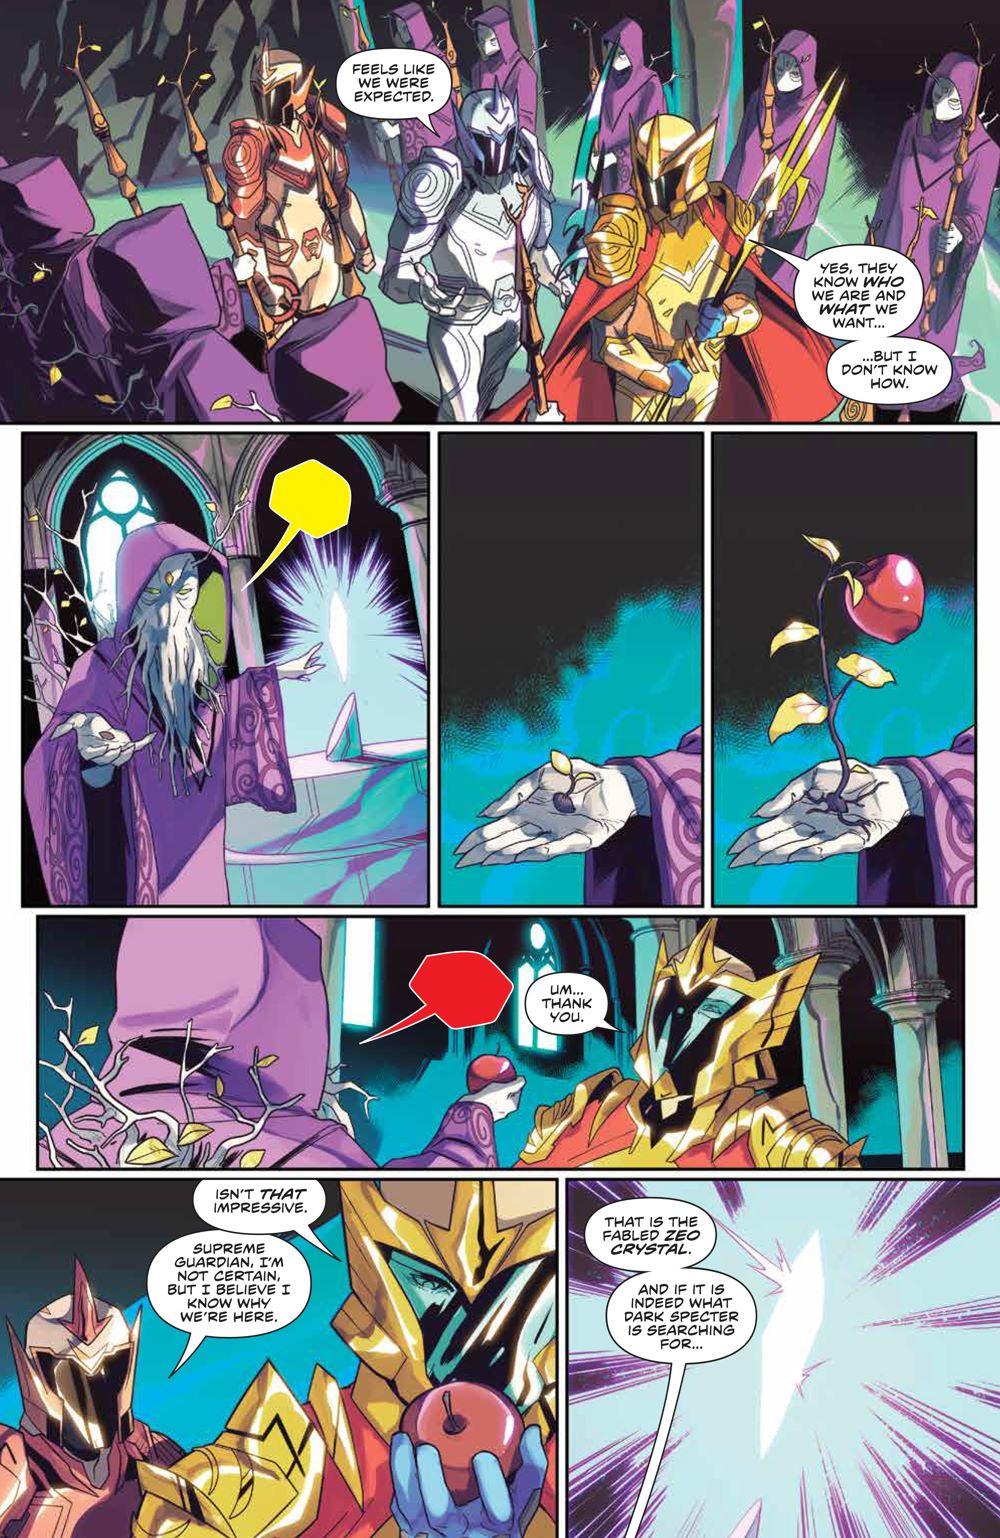 MightyMorphin_007_PRESS_5 ComicList Previews: MIGHTY MORPHIN #7